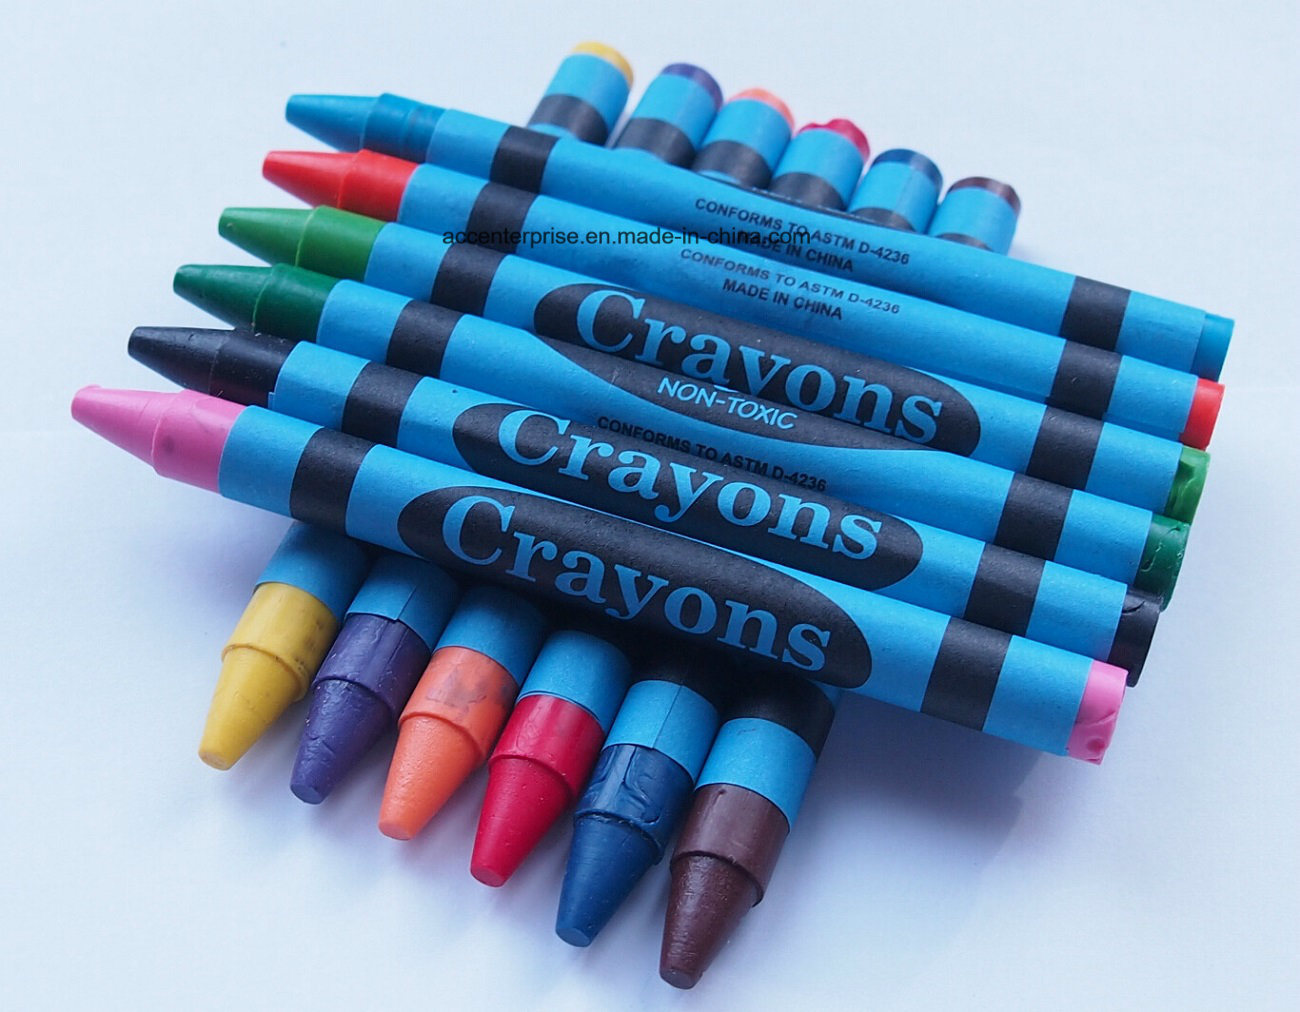 Wax Crayon, Super Jumbo Crayon, Jumbo Crayon, Regular Crayon (ACC-2007)